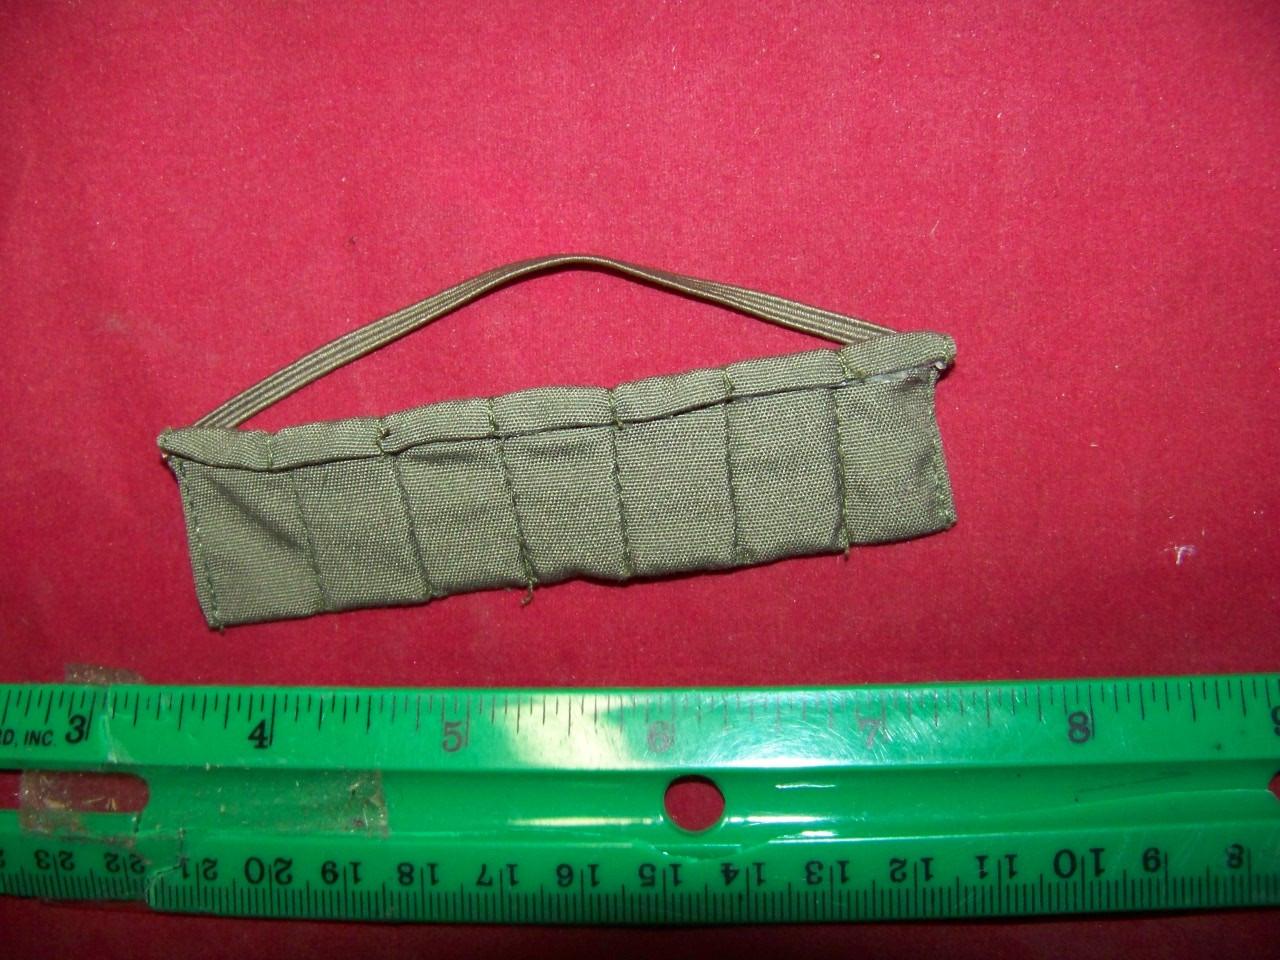 1//6 Scale 21st Century Nam 2 x Claymore Mines /& 1 x Shoulder  Bag